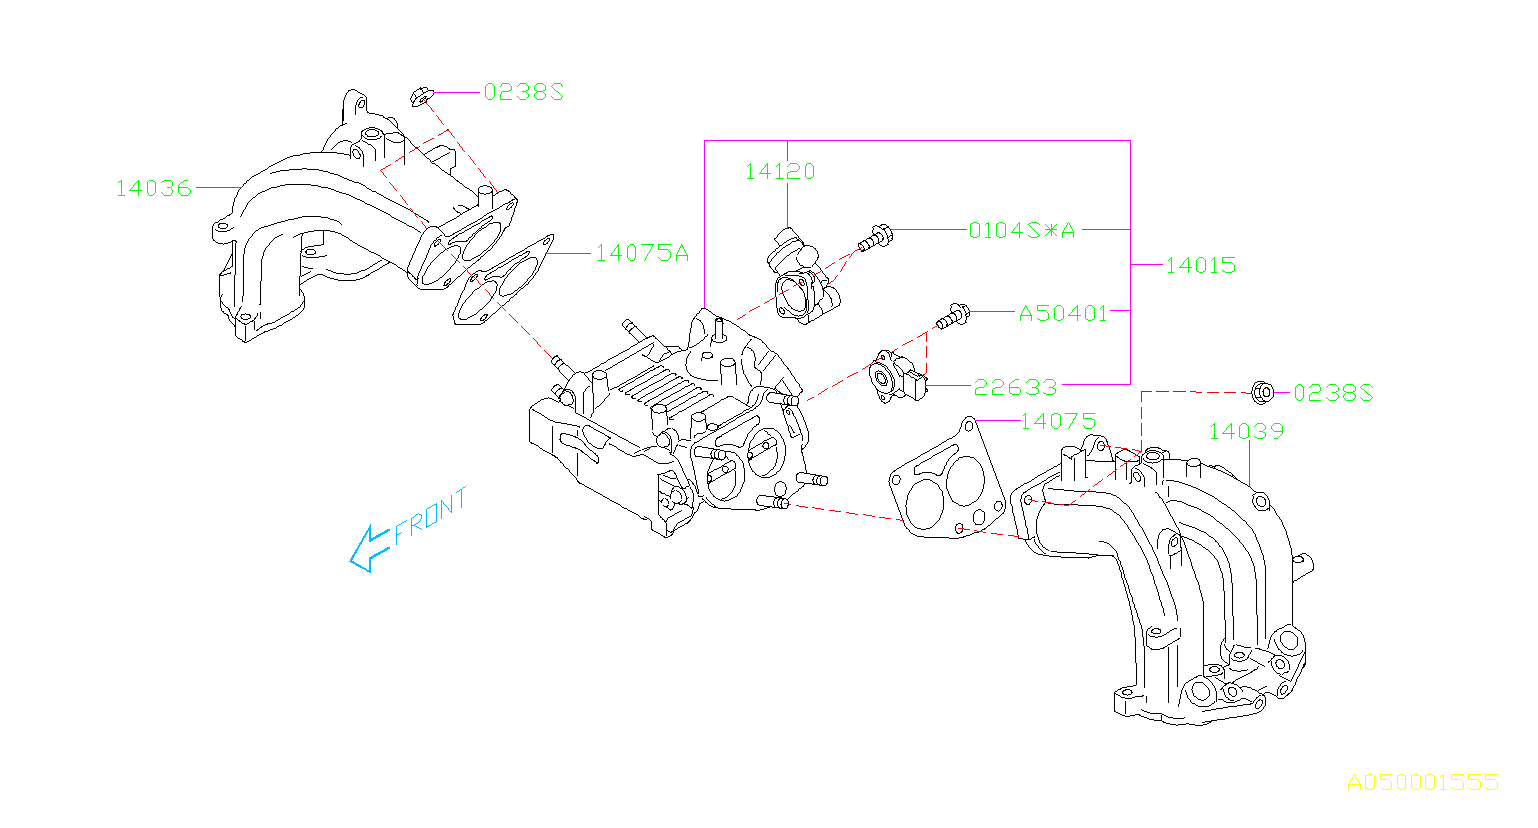 2005 subaru legacy motor assembly-intake manifold  body